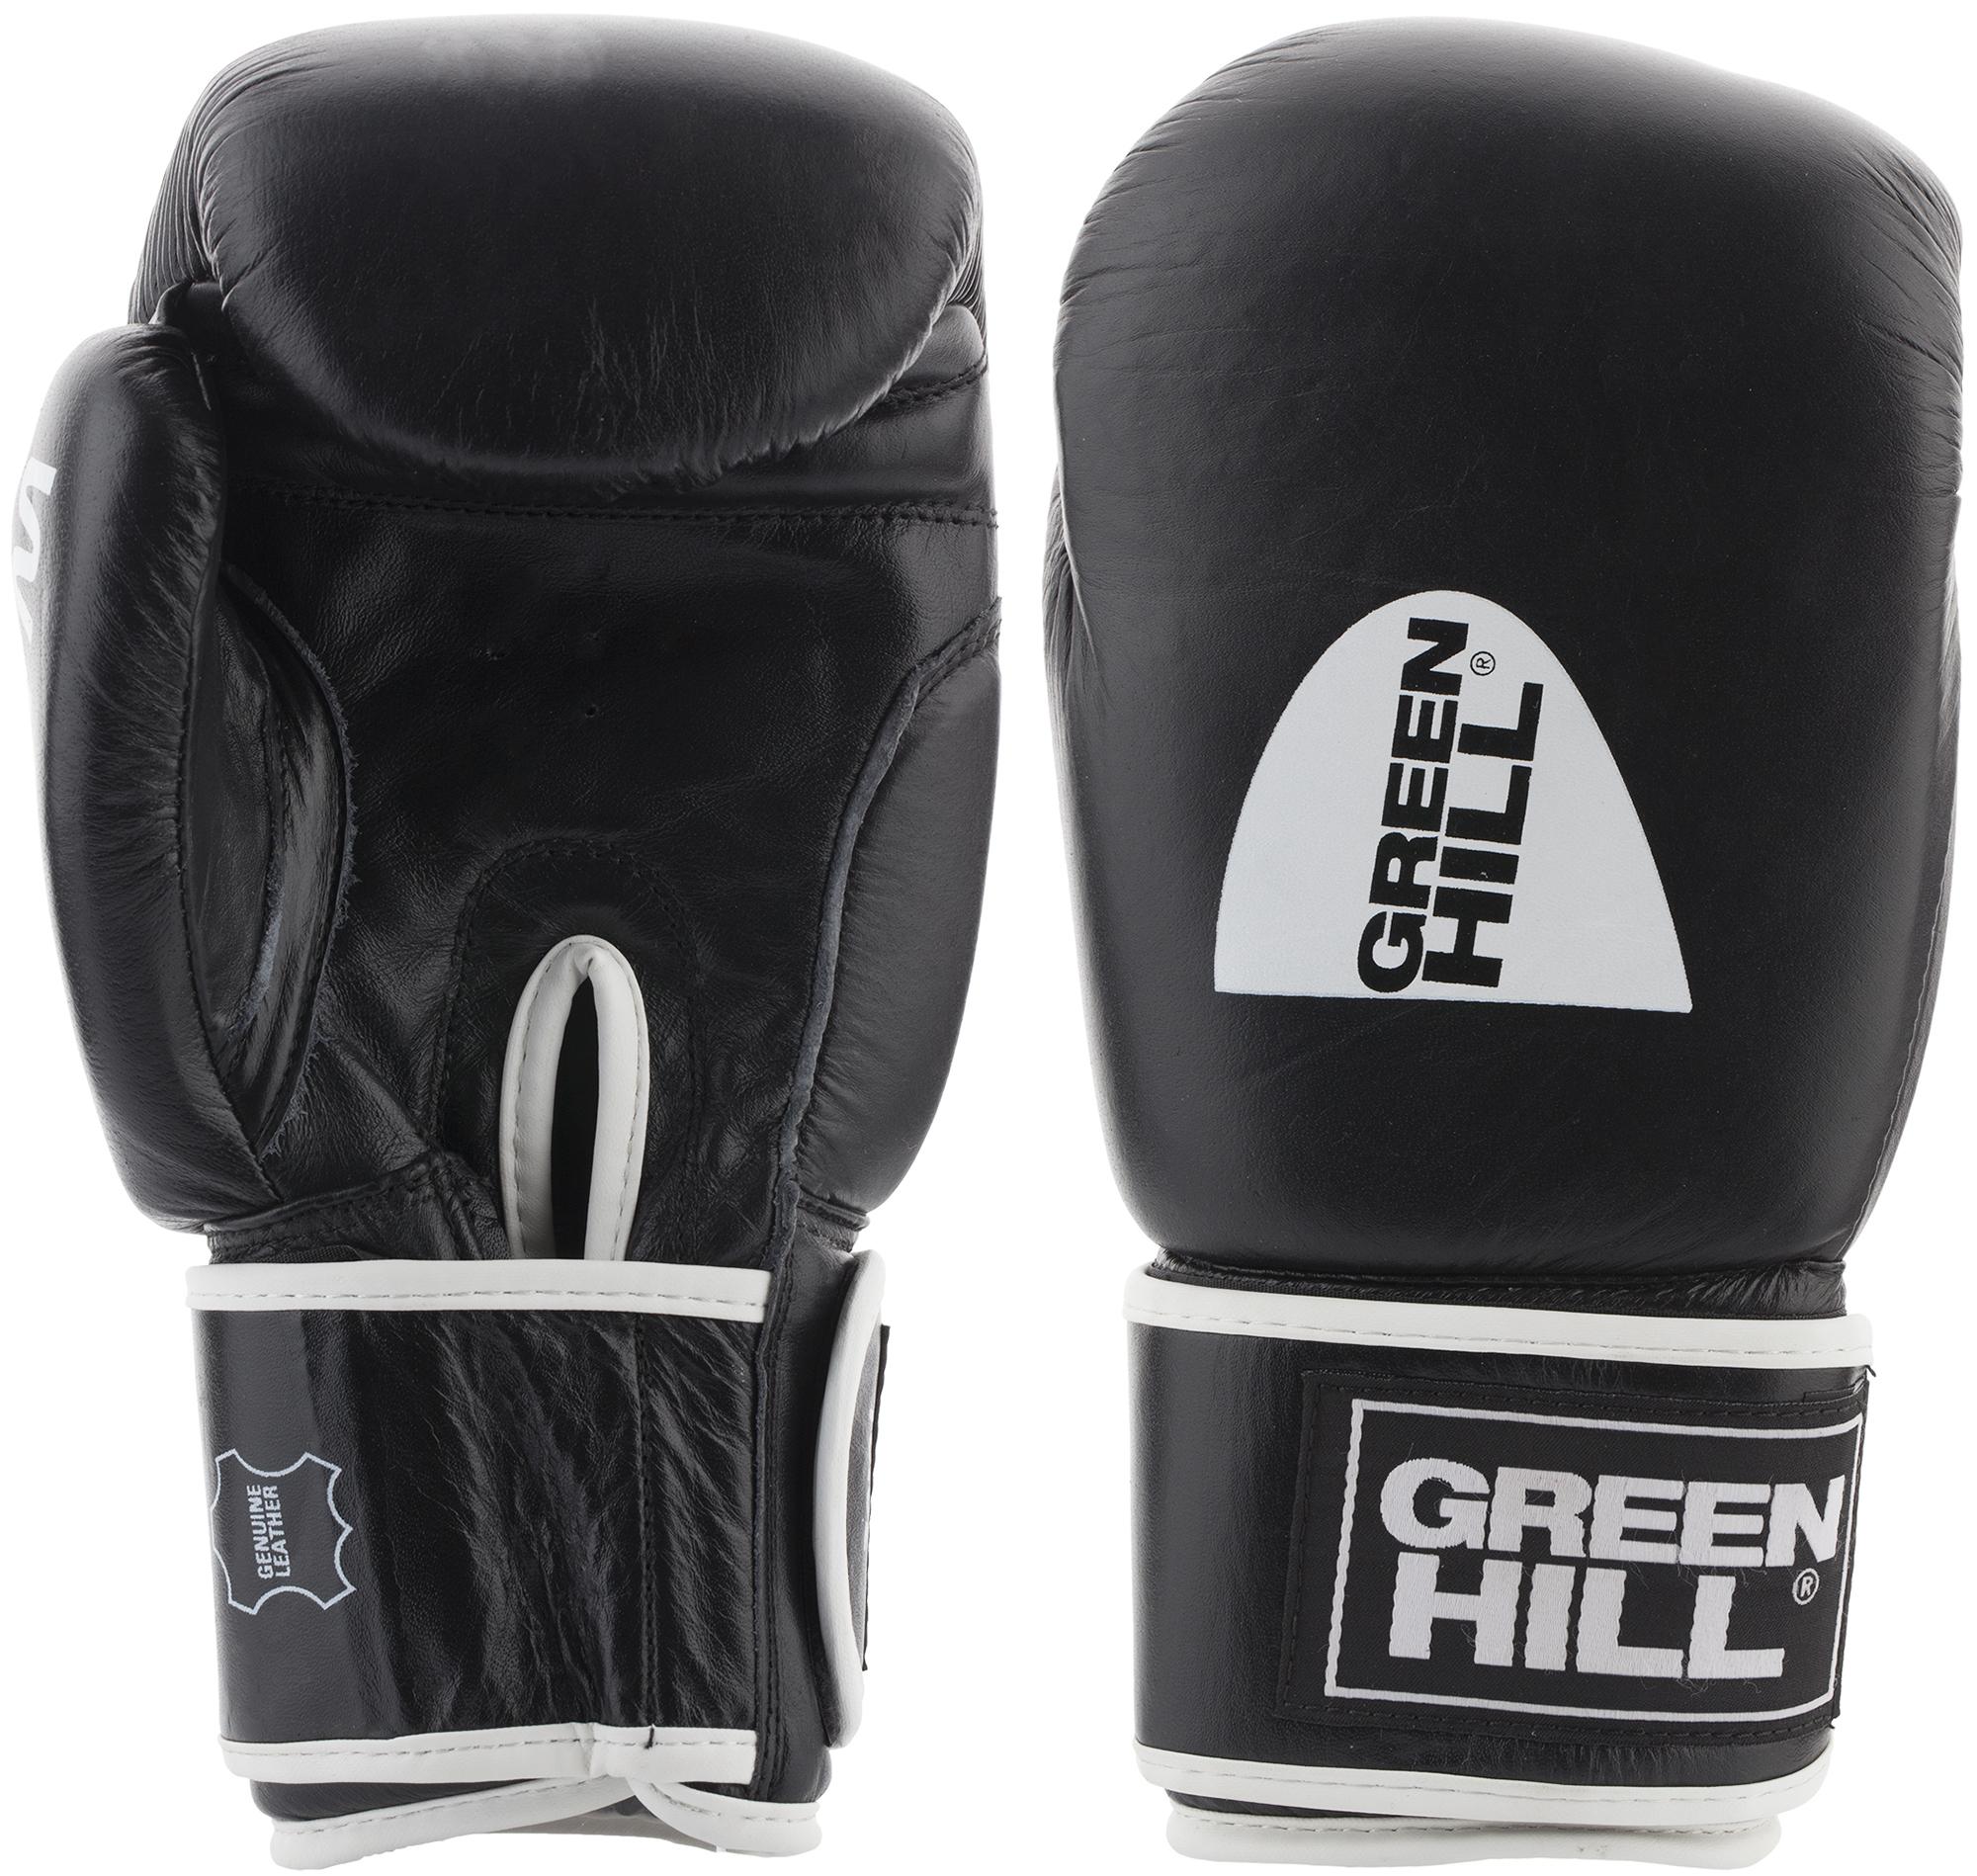 Green Hill Перчатки боксерские Green Hill Gym, размер 14 oz